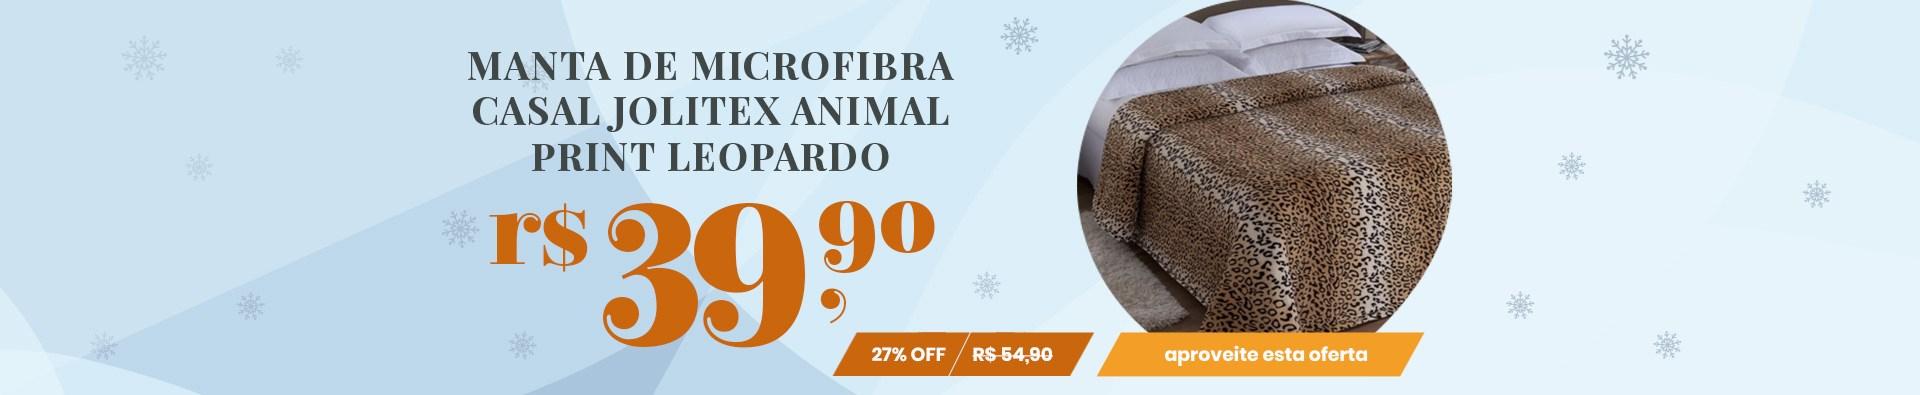 Manta de Microfibra Casal Jolitex Animal Print Leopardo